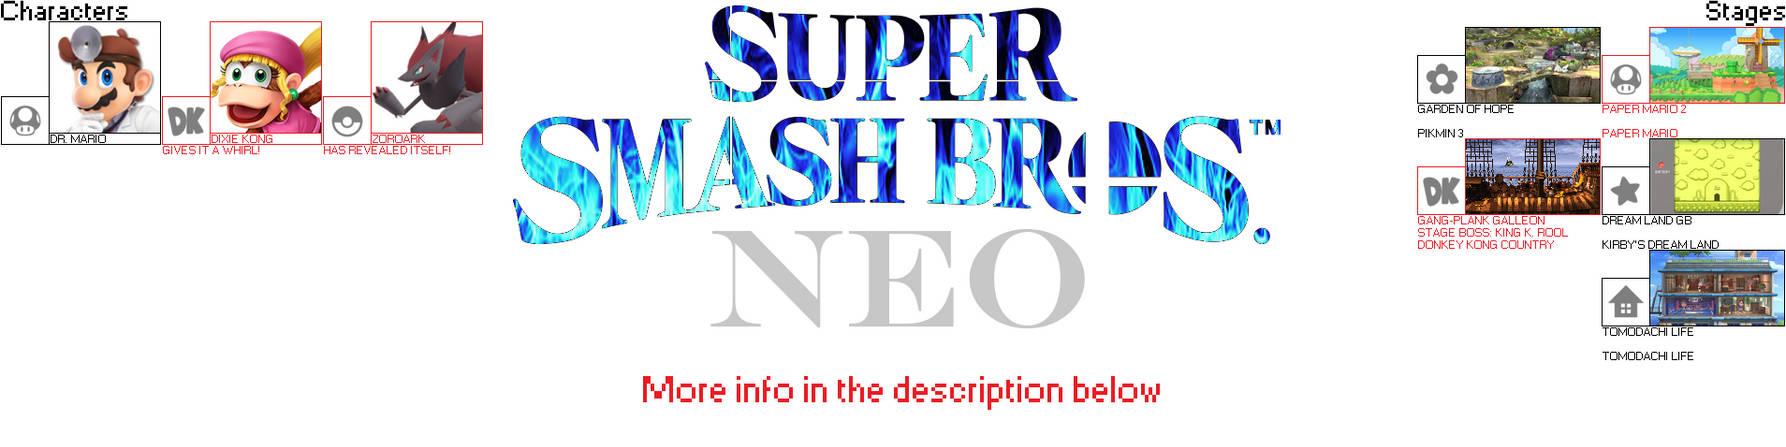 Super Smash Bros  Neo - Secrets 2 by FlameEagle25 on DeviantArt